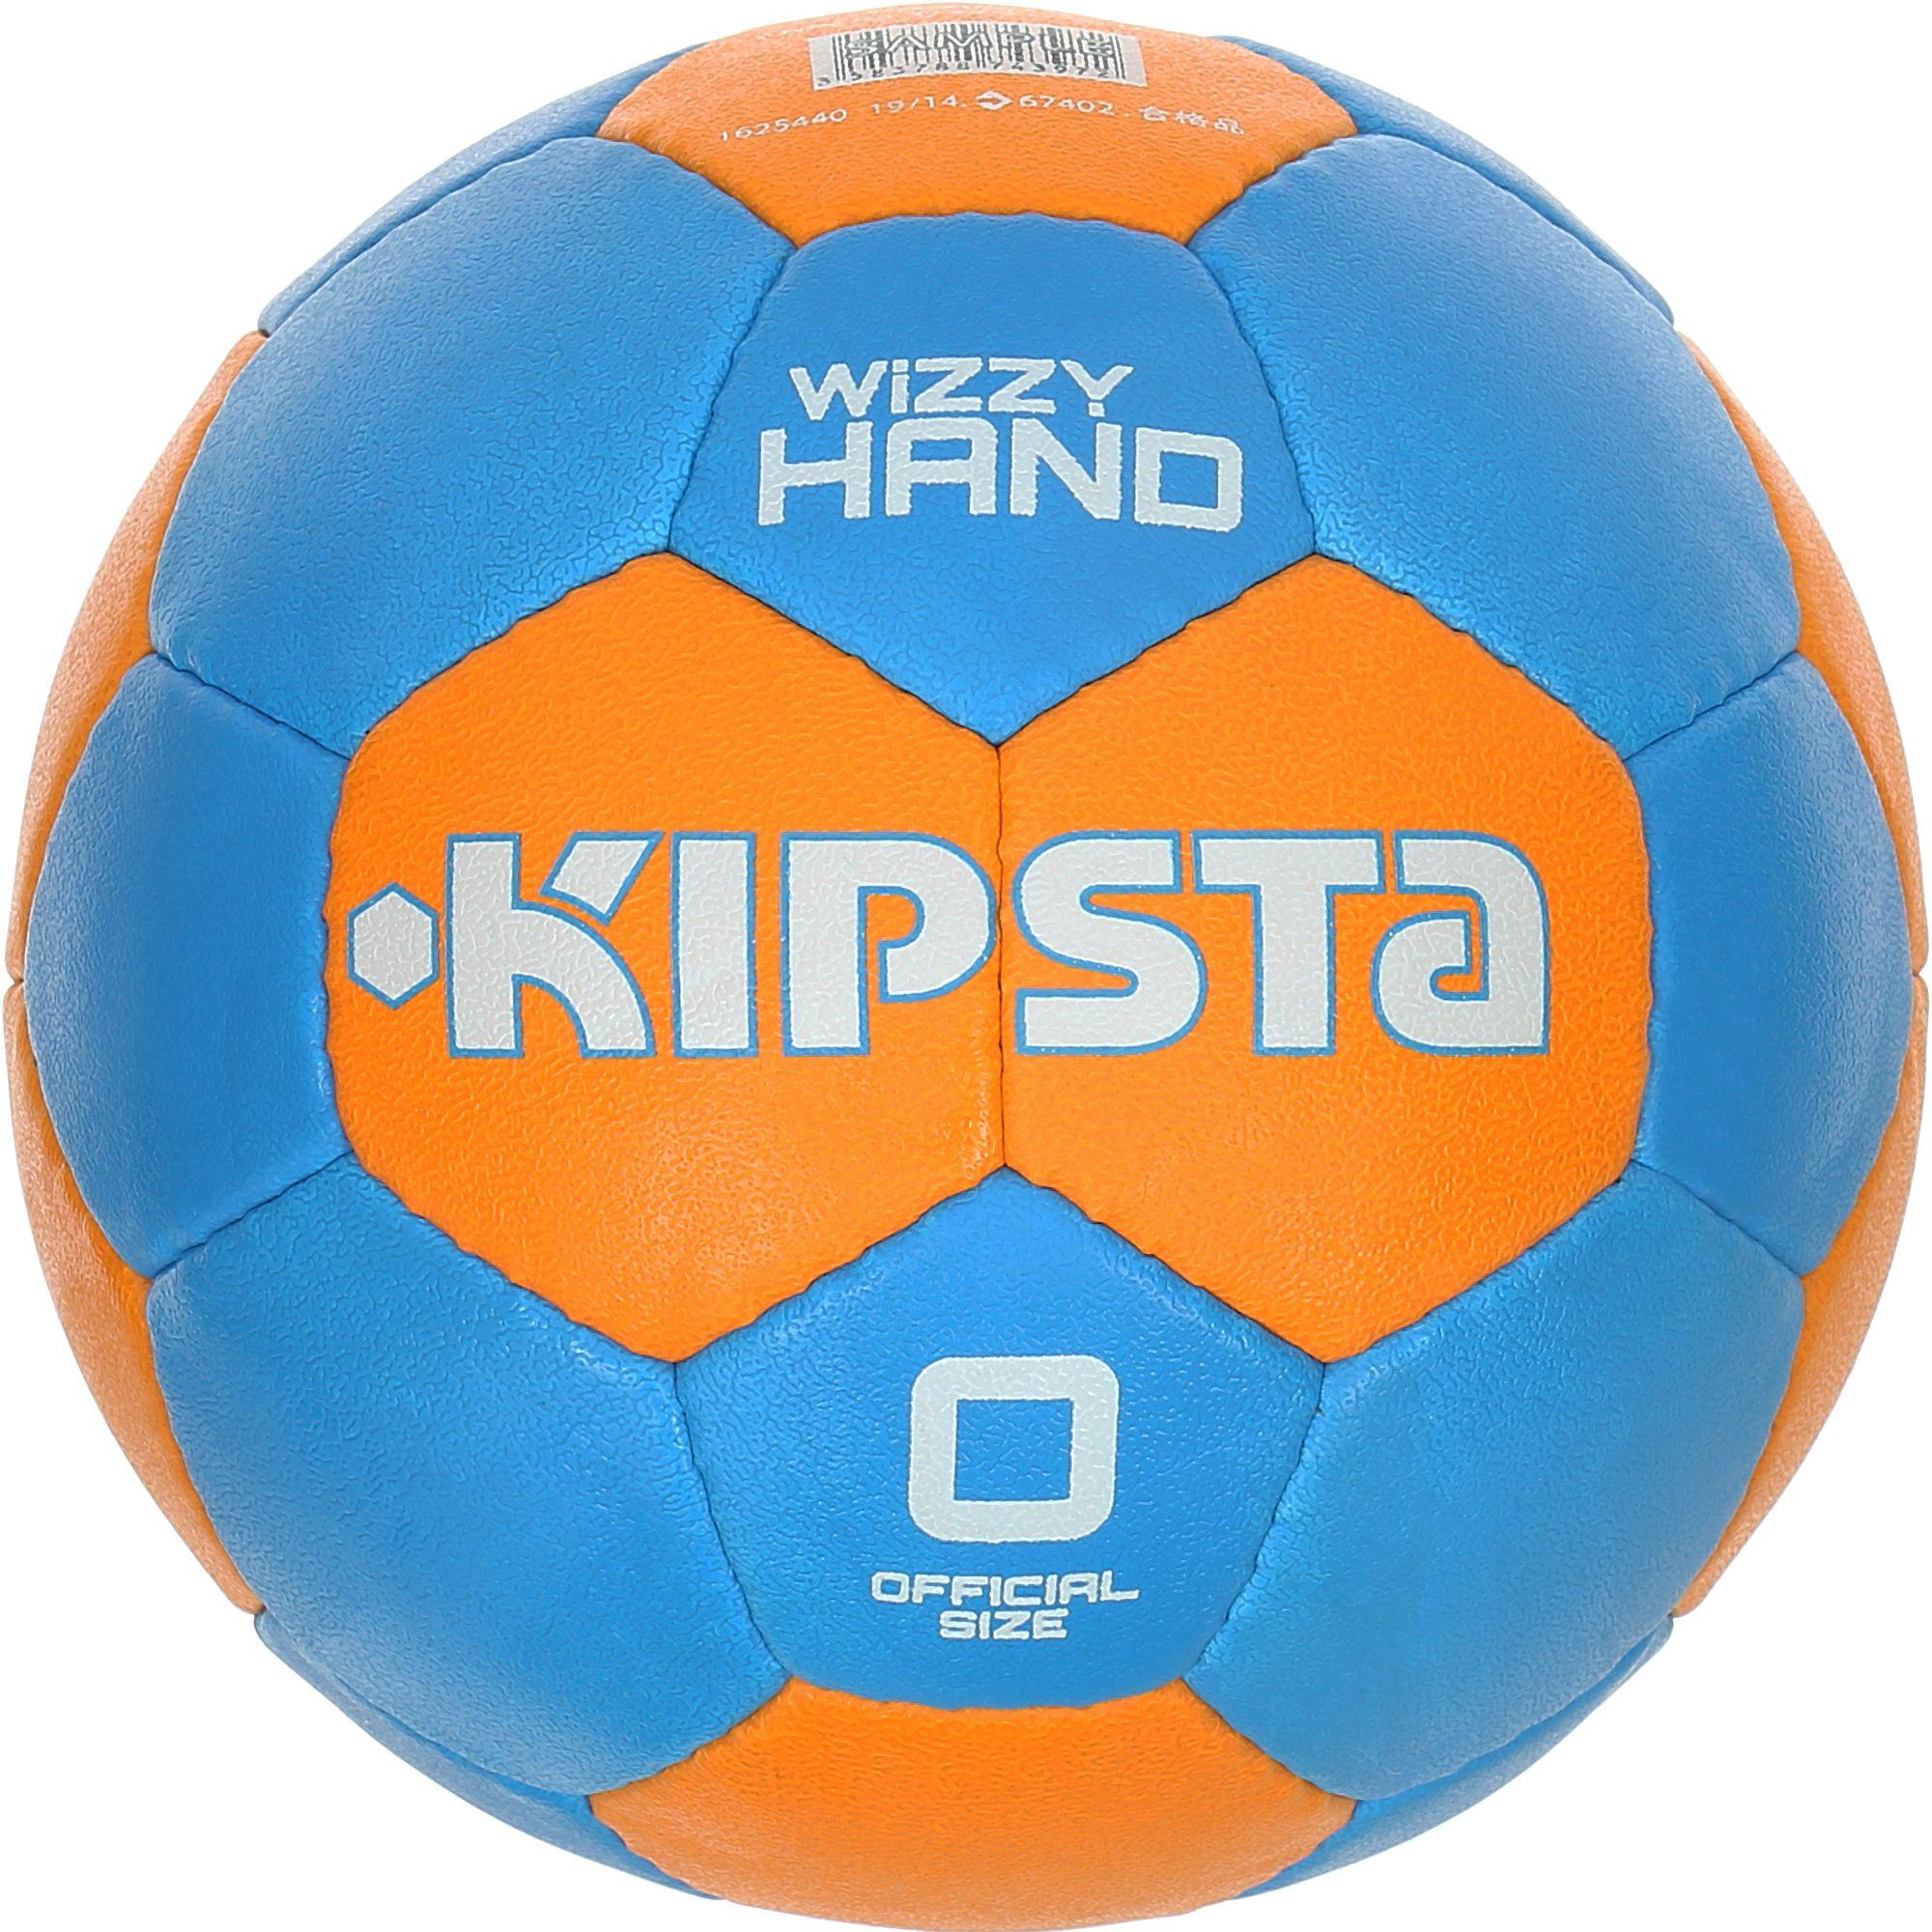 Ballon handball enfant Wizzy Hand taille 0 bleu clair orange